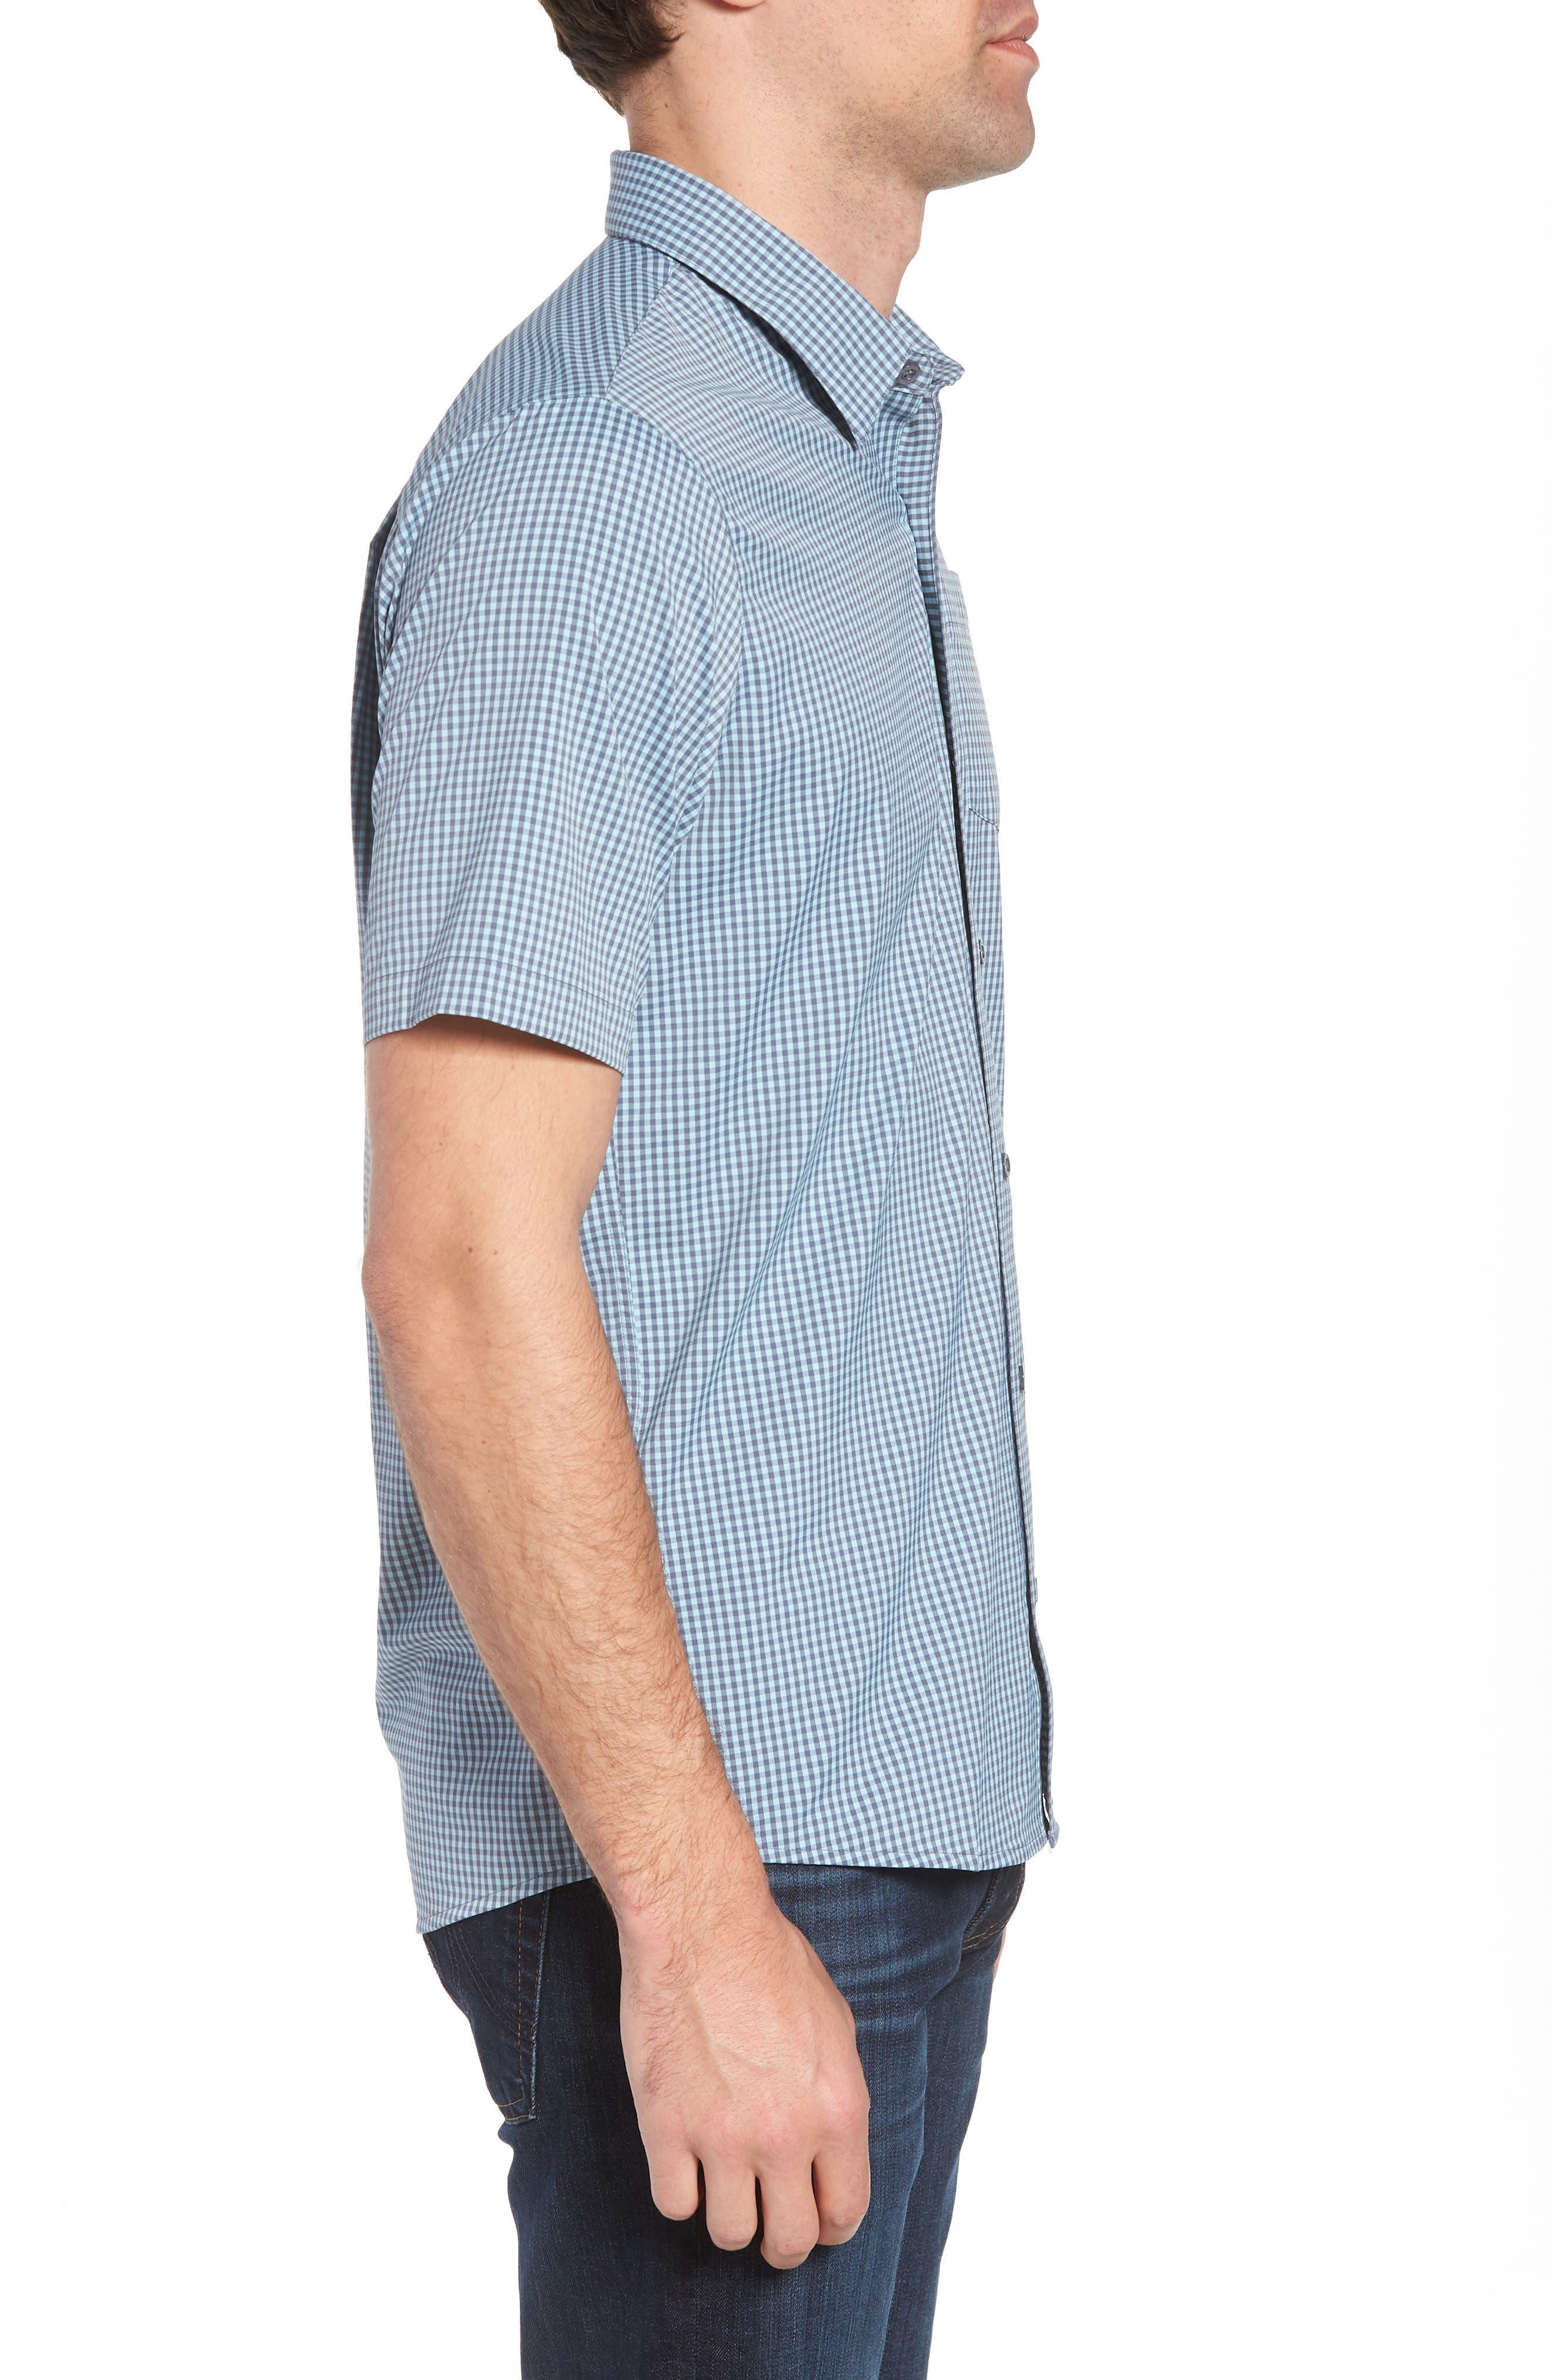 Gygax Regular Fit Sport Shirt,                             Alternate thumbnail 4, color,                             Porcelain Blue